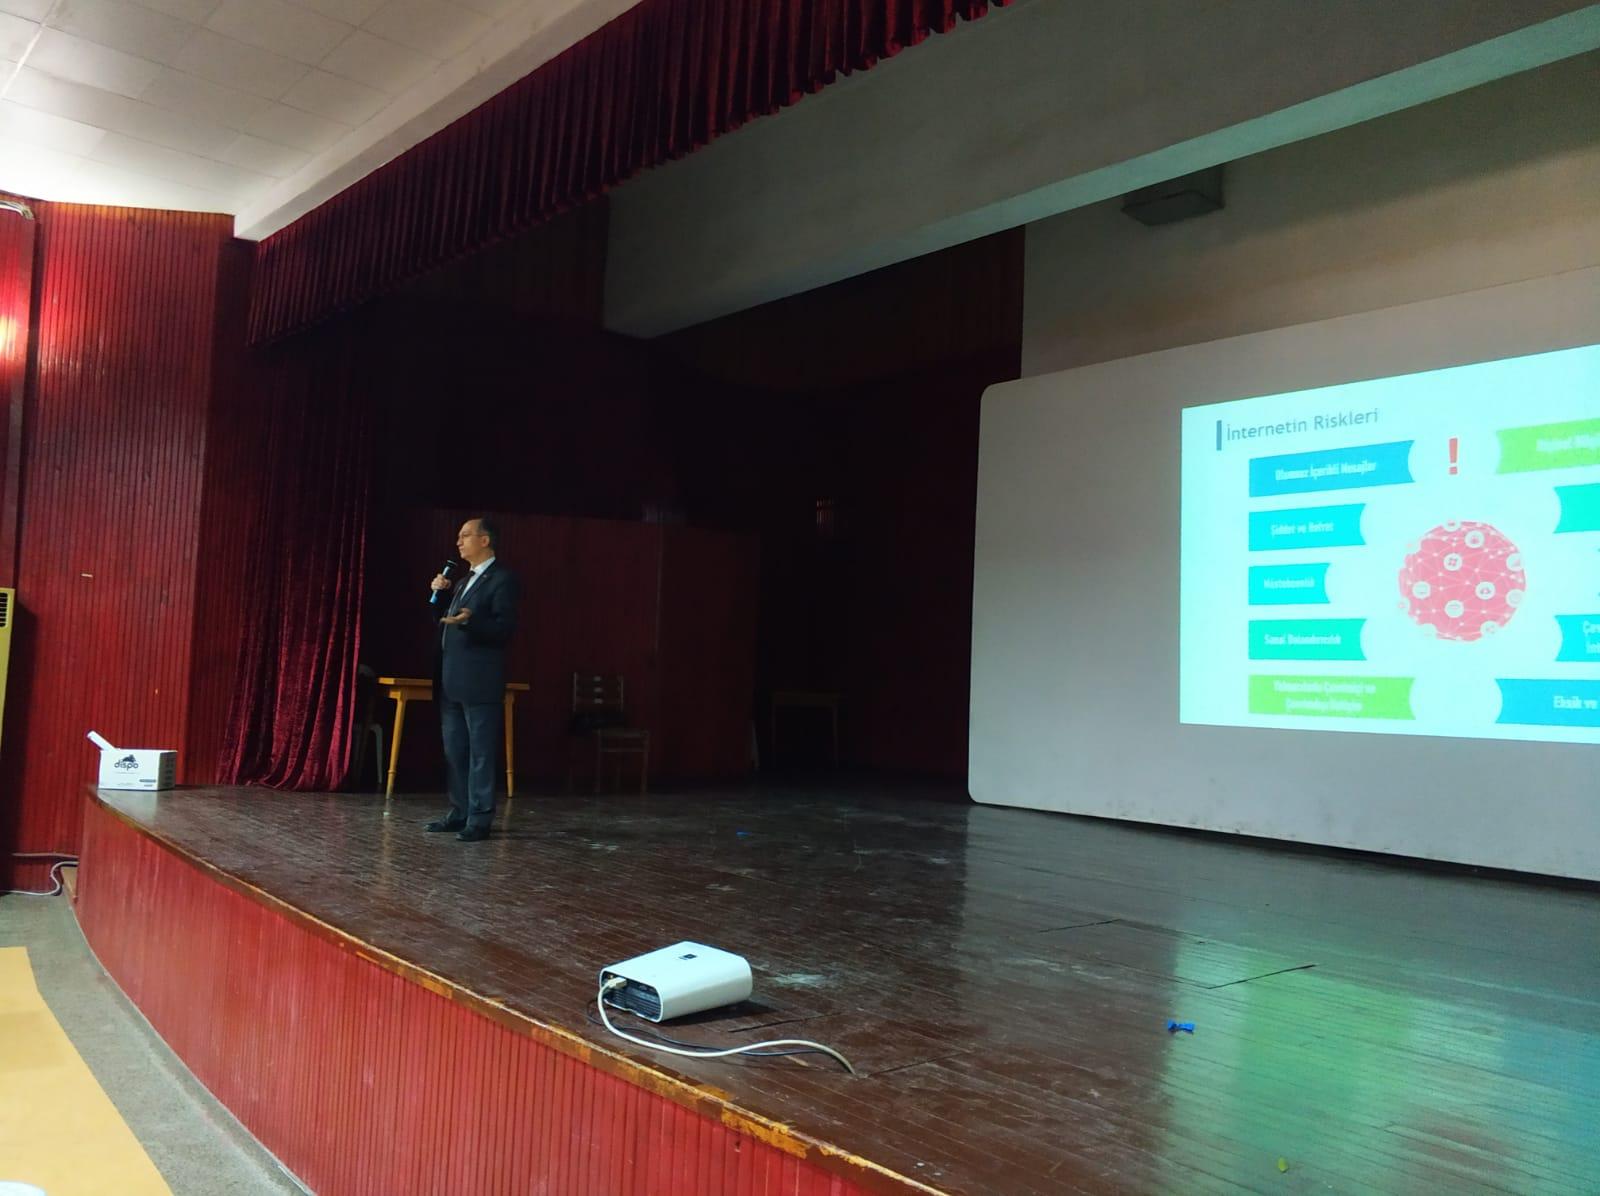 Aydın Sultanhisar, Sultanhisar Ortaokulu, Bilinçli Ve Güvenli İnternet Semineri